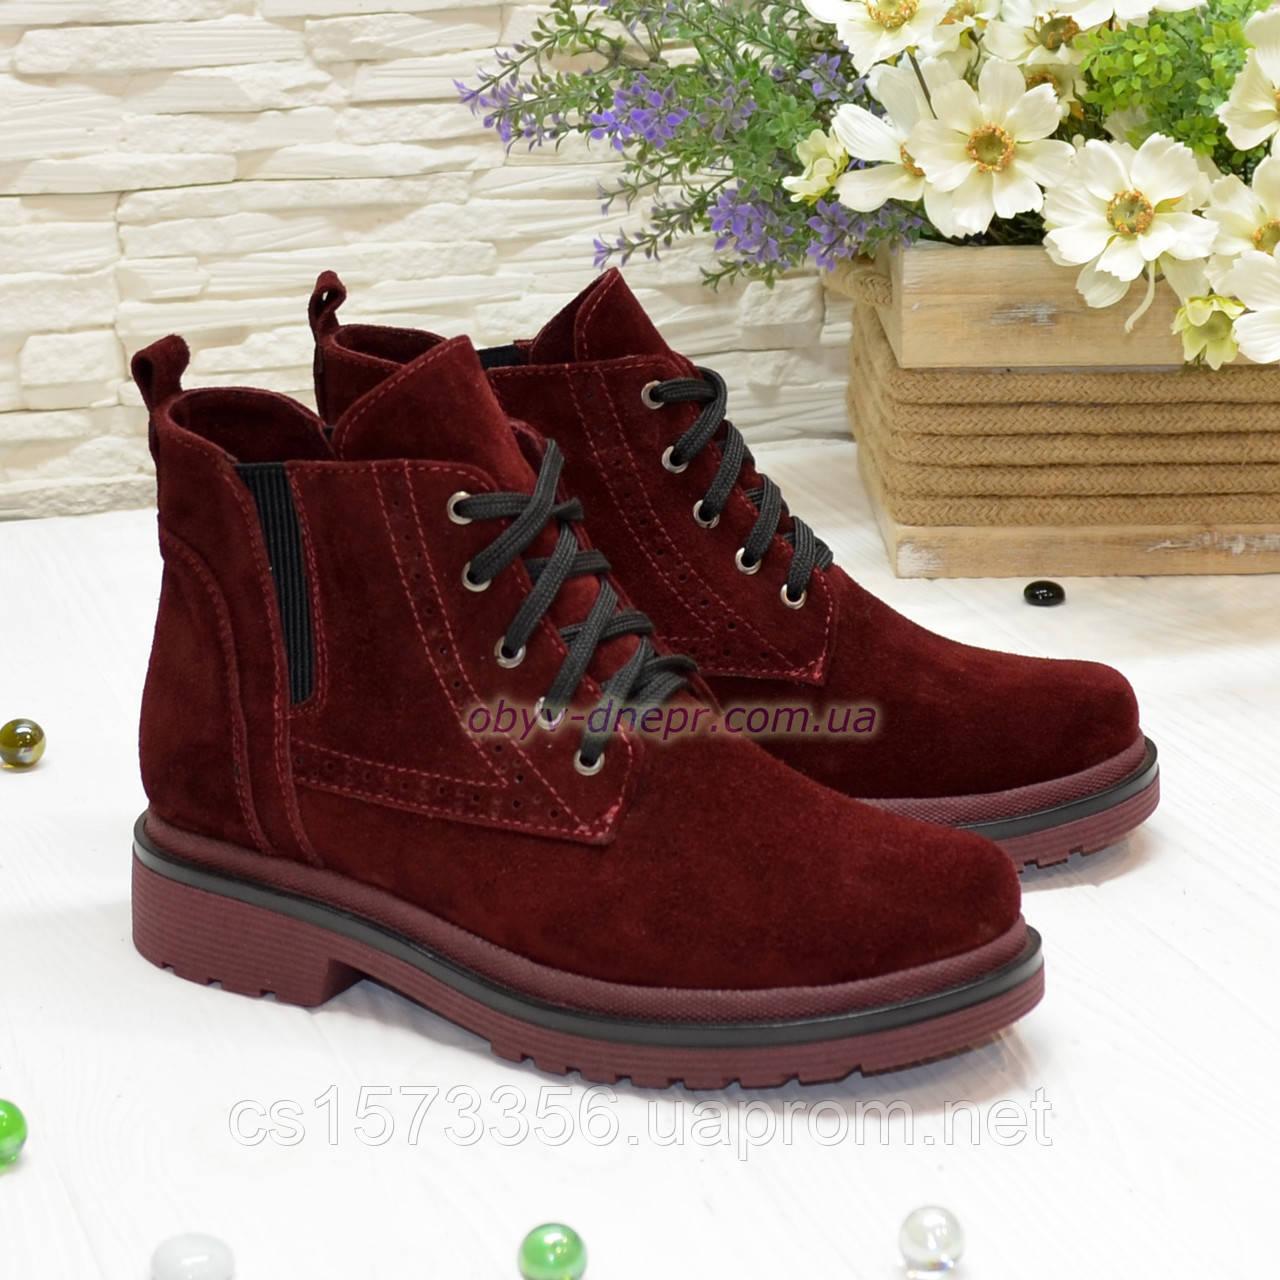 Ботинки женские на маленьком каблуке, на шнурках. Цвет бордо